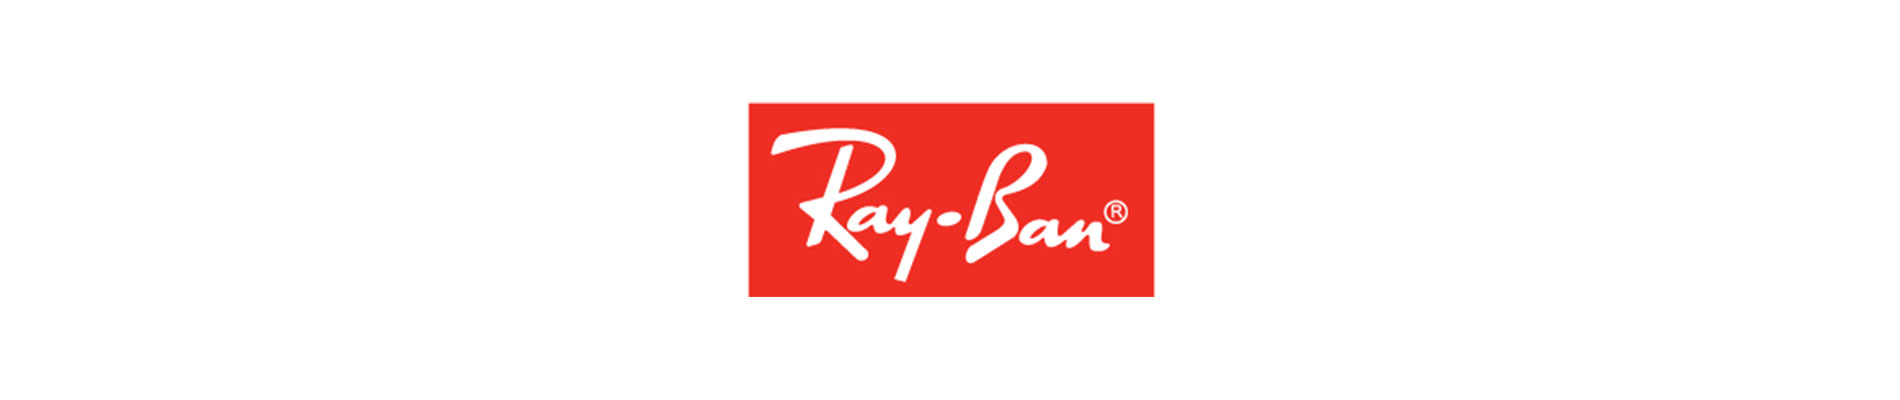 ray ban designer frames logo